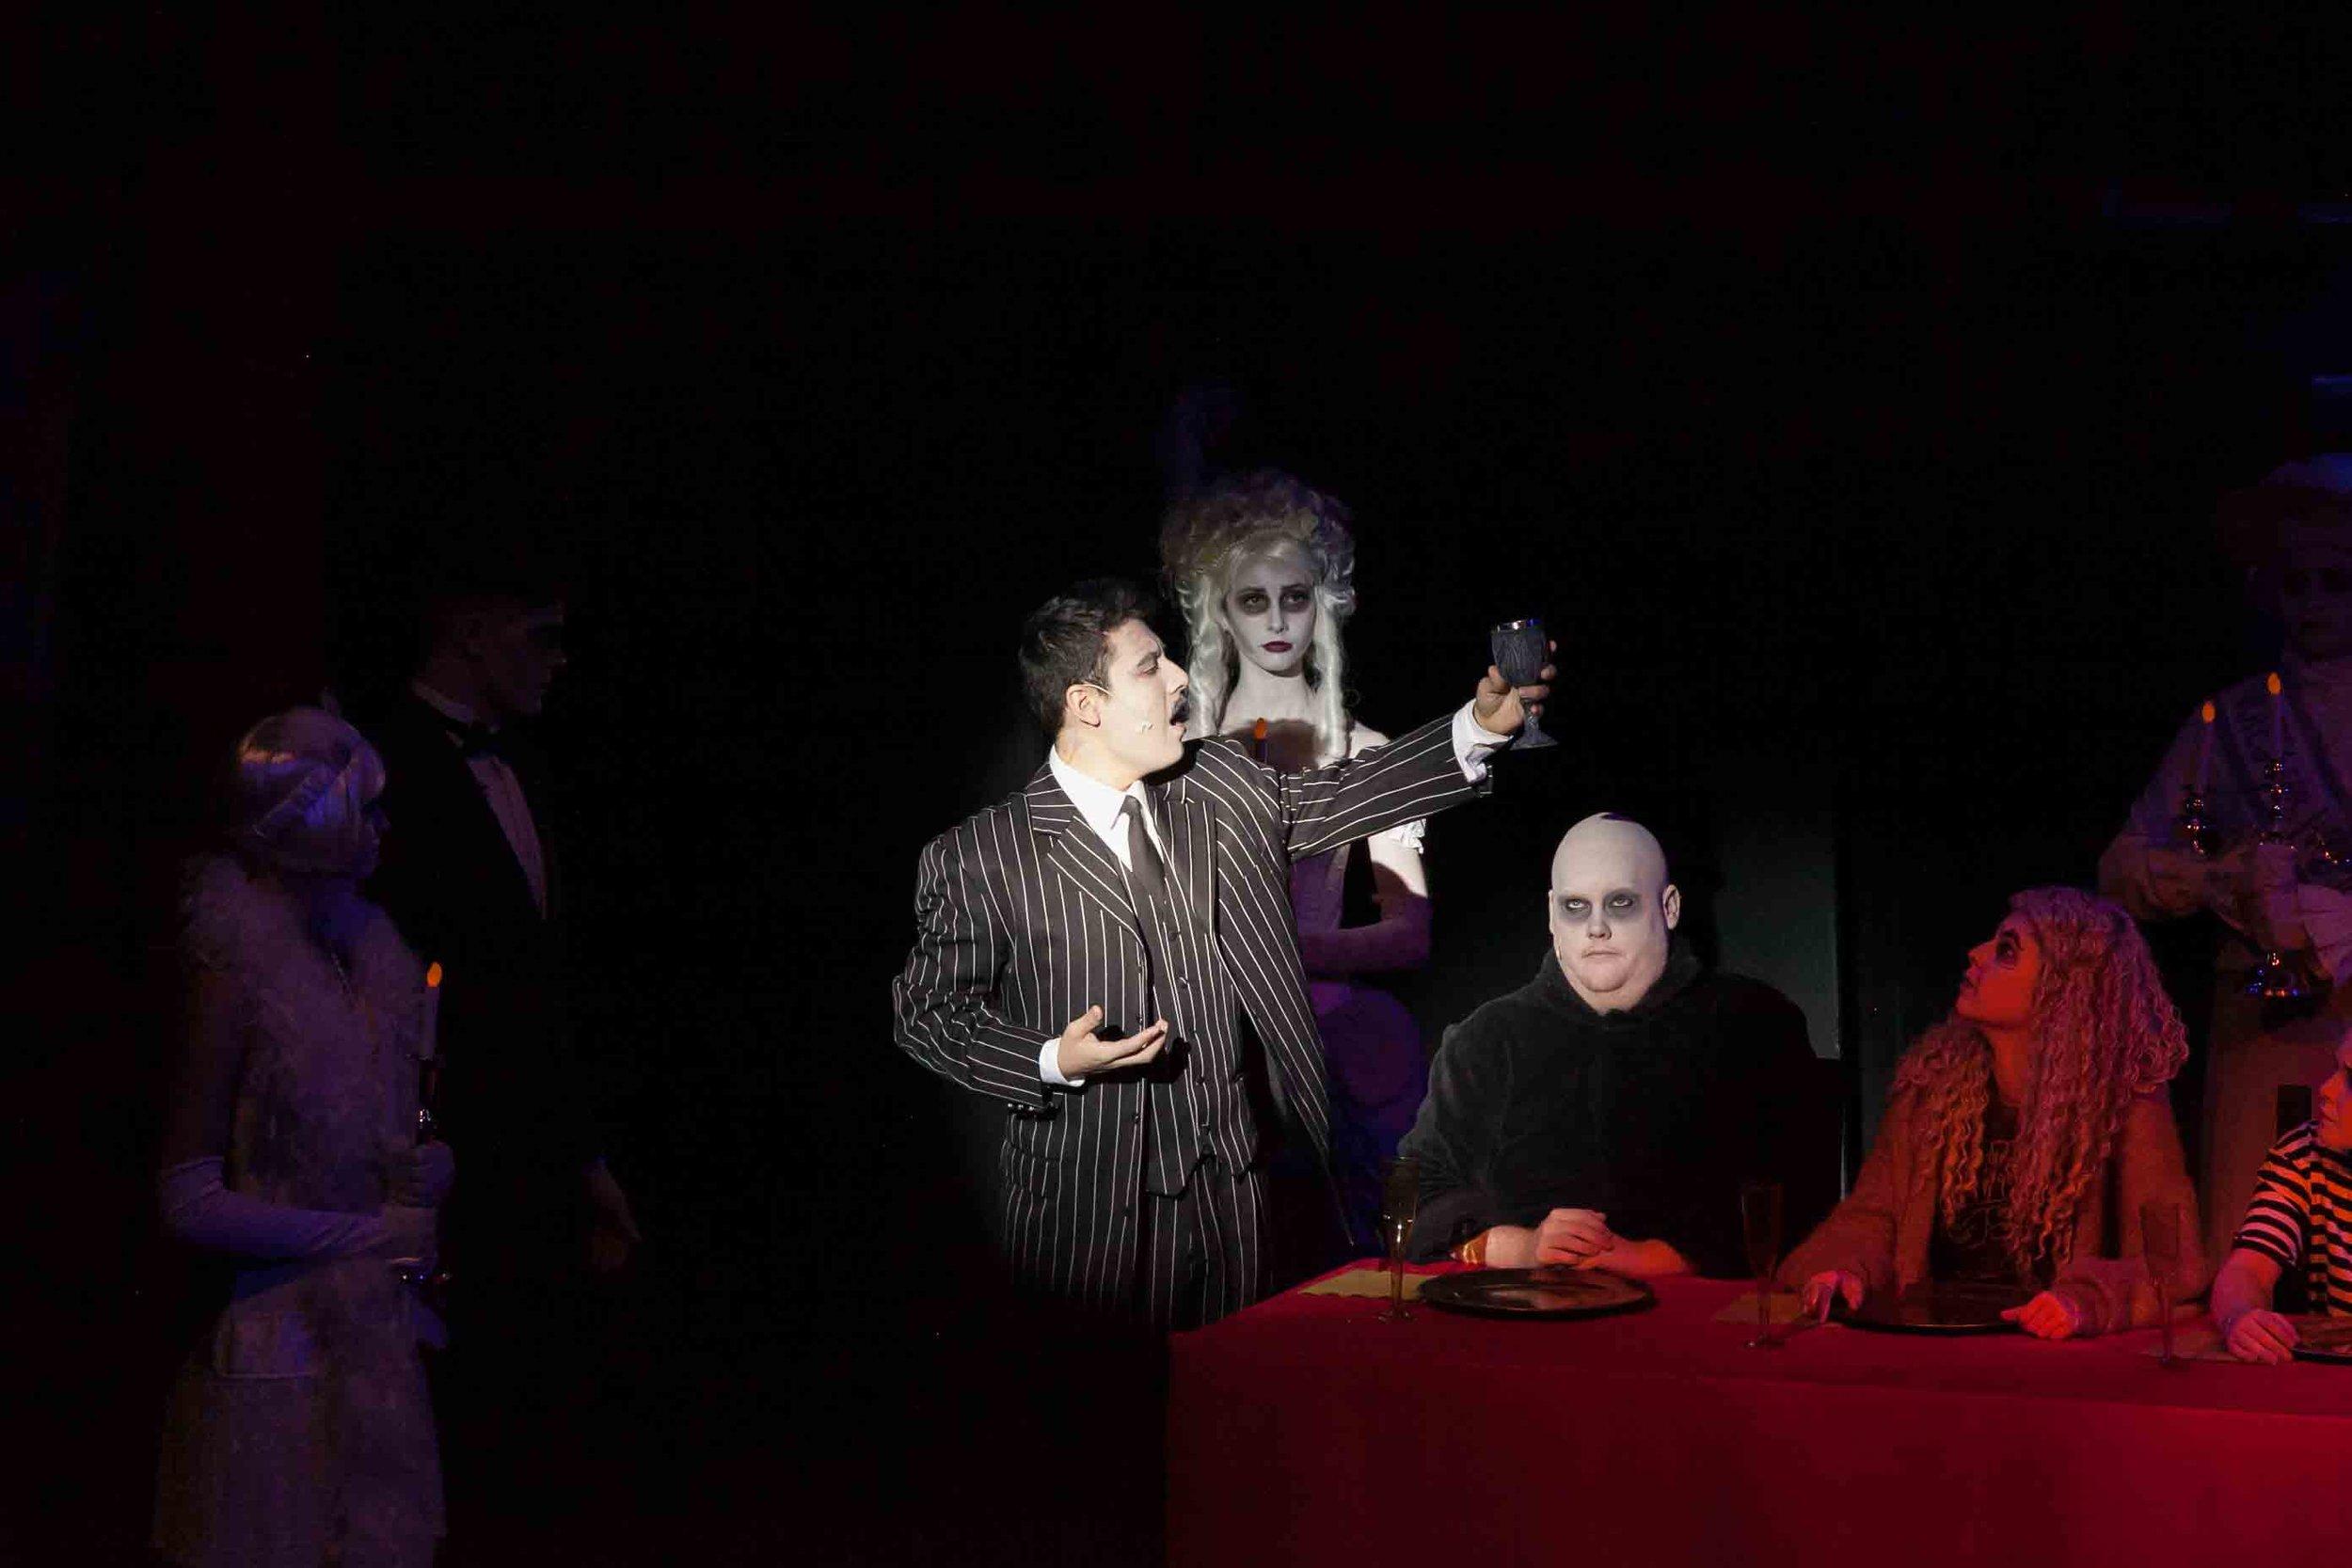 6-19-16 Addams Family Kooky Cast 0225.jpg